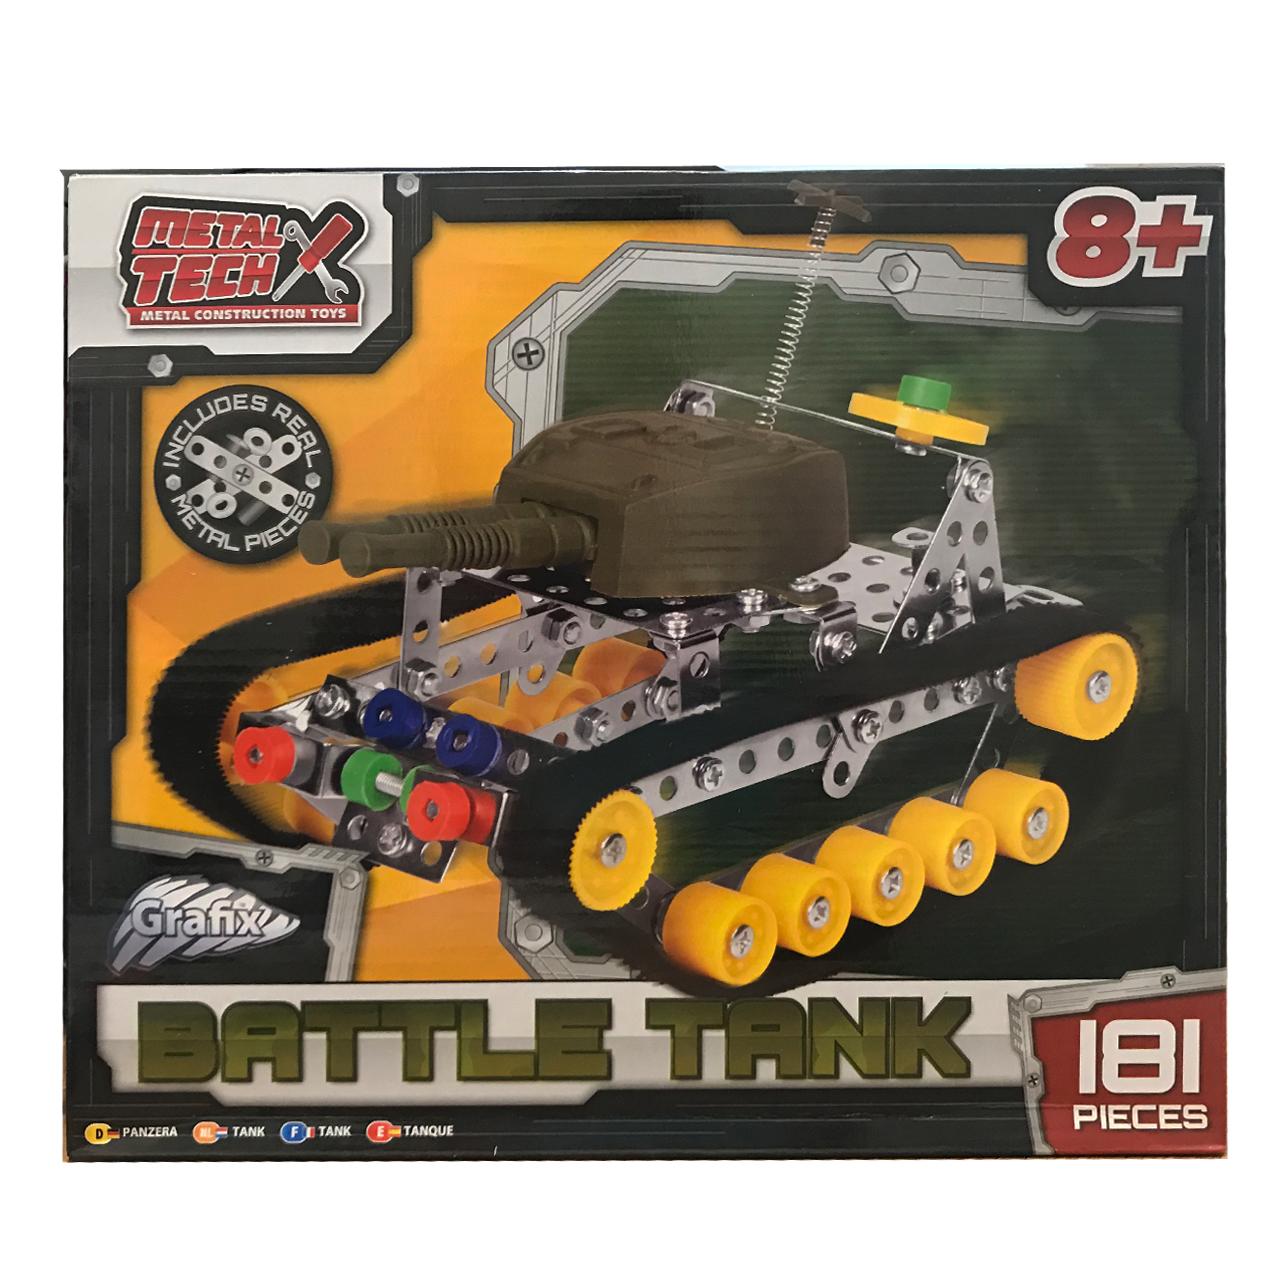 ساختنی گرافیکس مدل Battle Tank